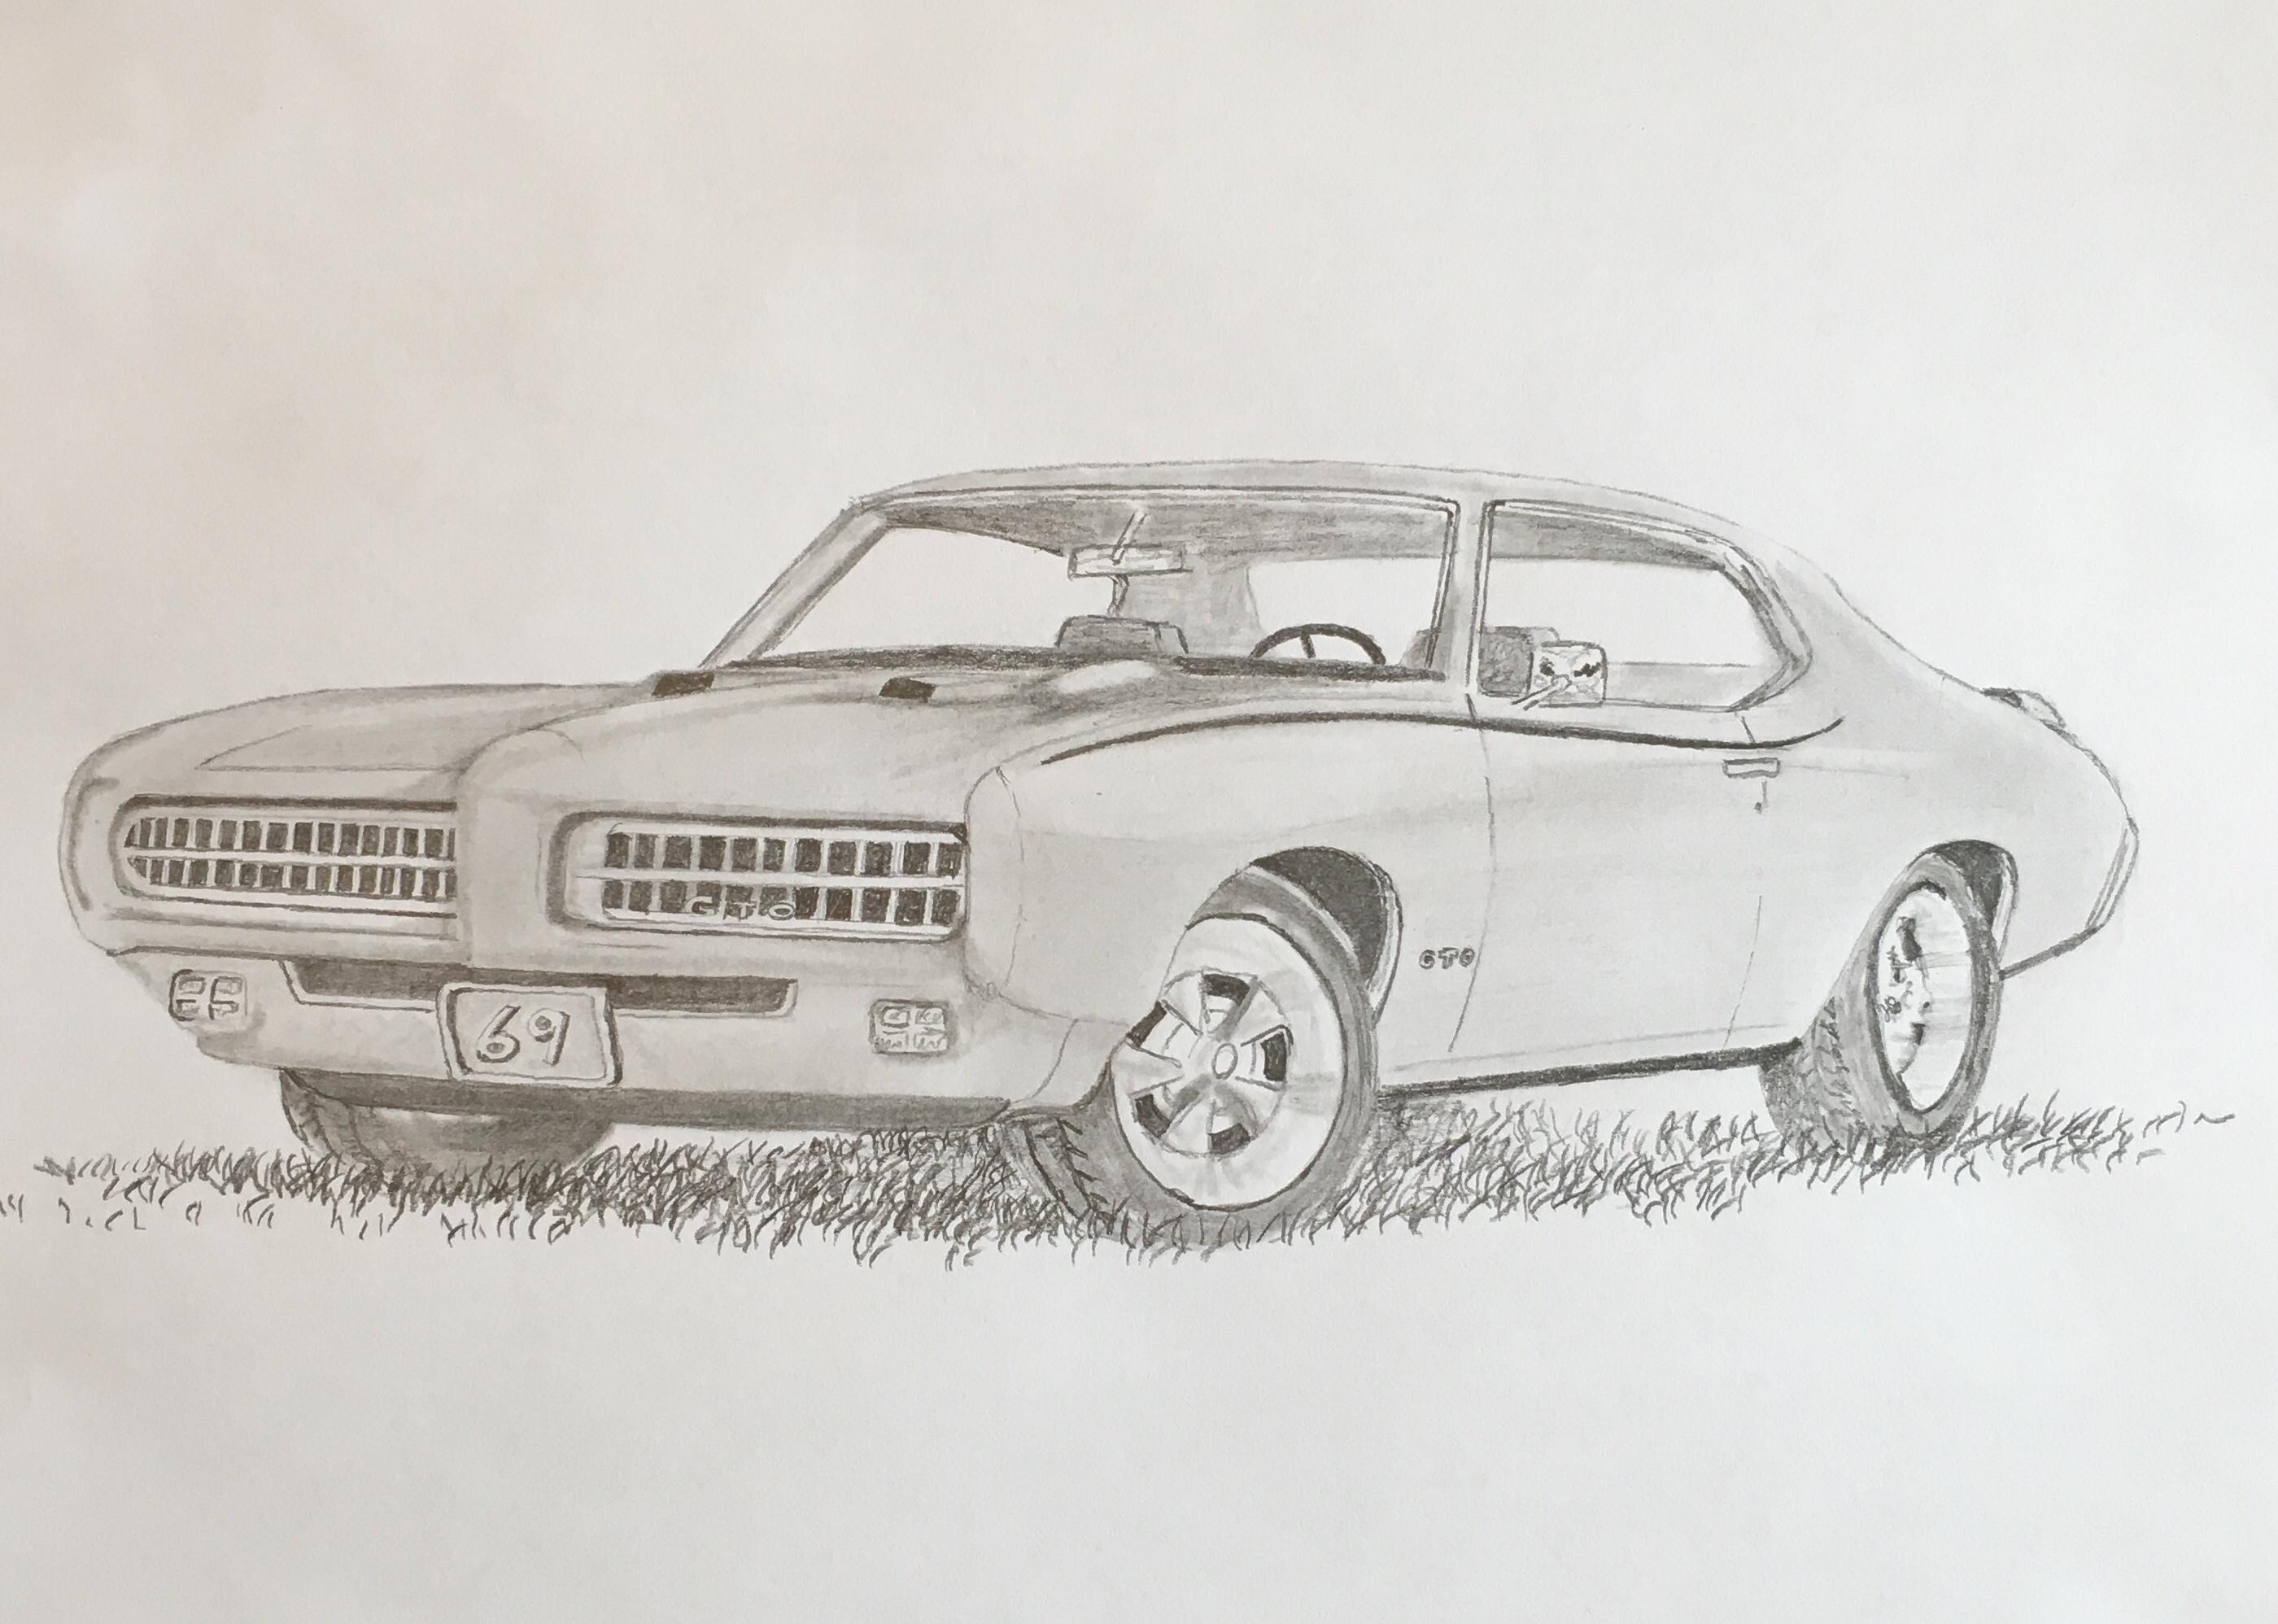 69 gto pencil drawing class art towne